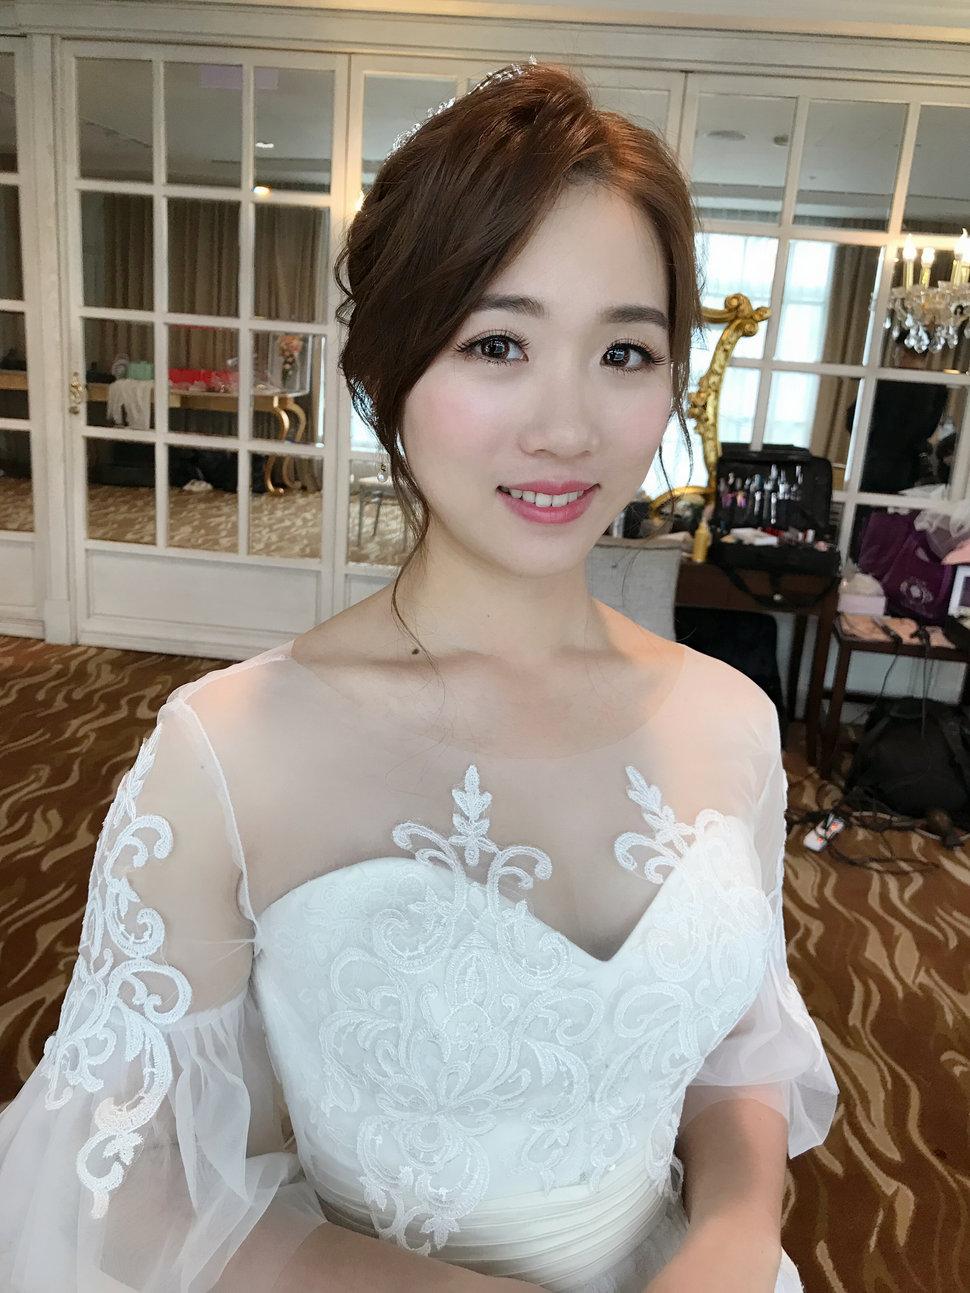 F7C9AA20-ADED-492E-9502-36B8A75104CF - 全台新祕 銘鴻 Hong stylist《結婚吧》